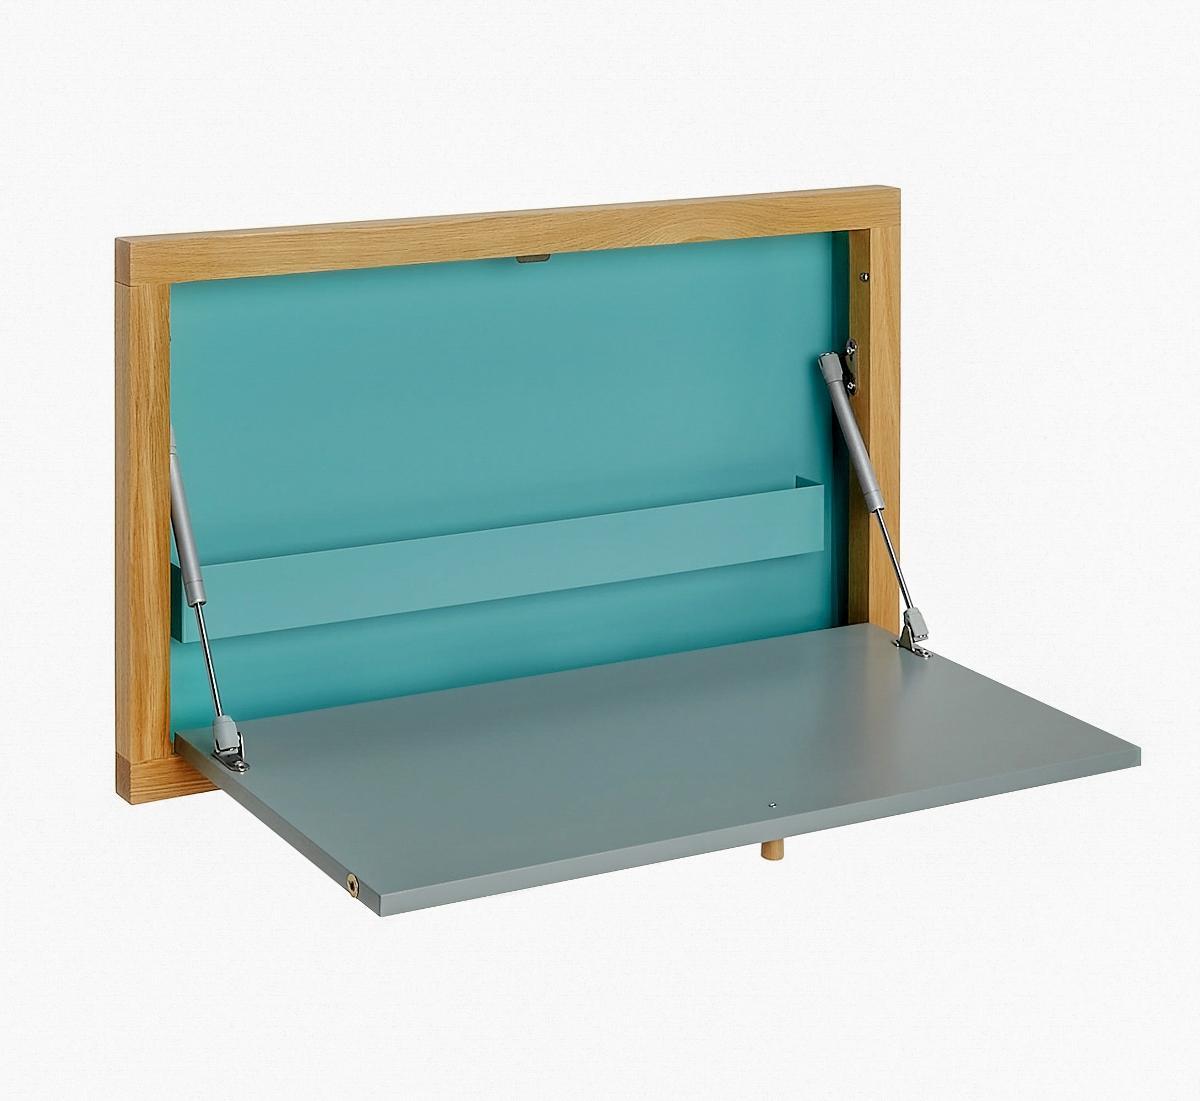 wandsekret r brenta von woodman f r kleine r ume. Black Bedroom Furniture Sets. Home Design Ideas